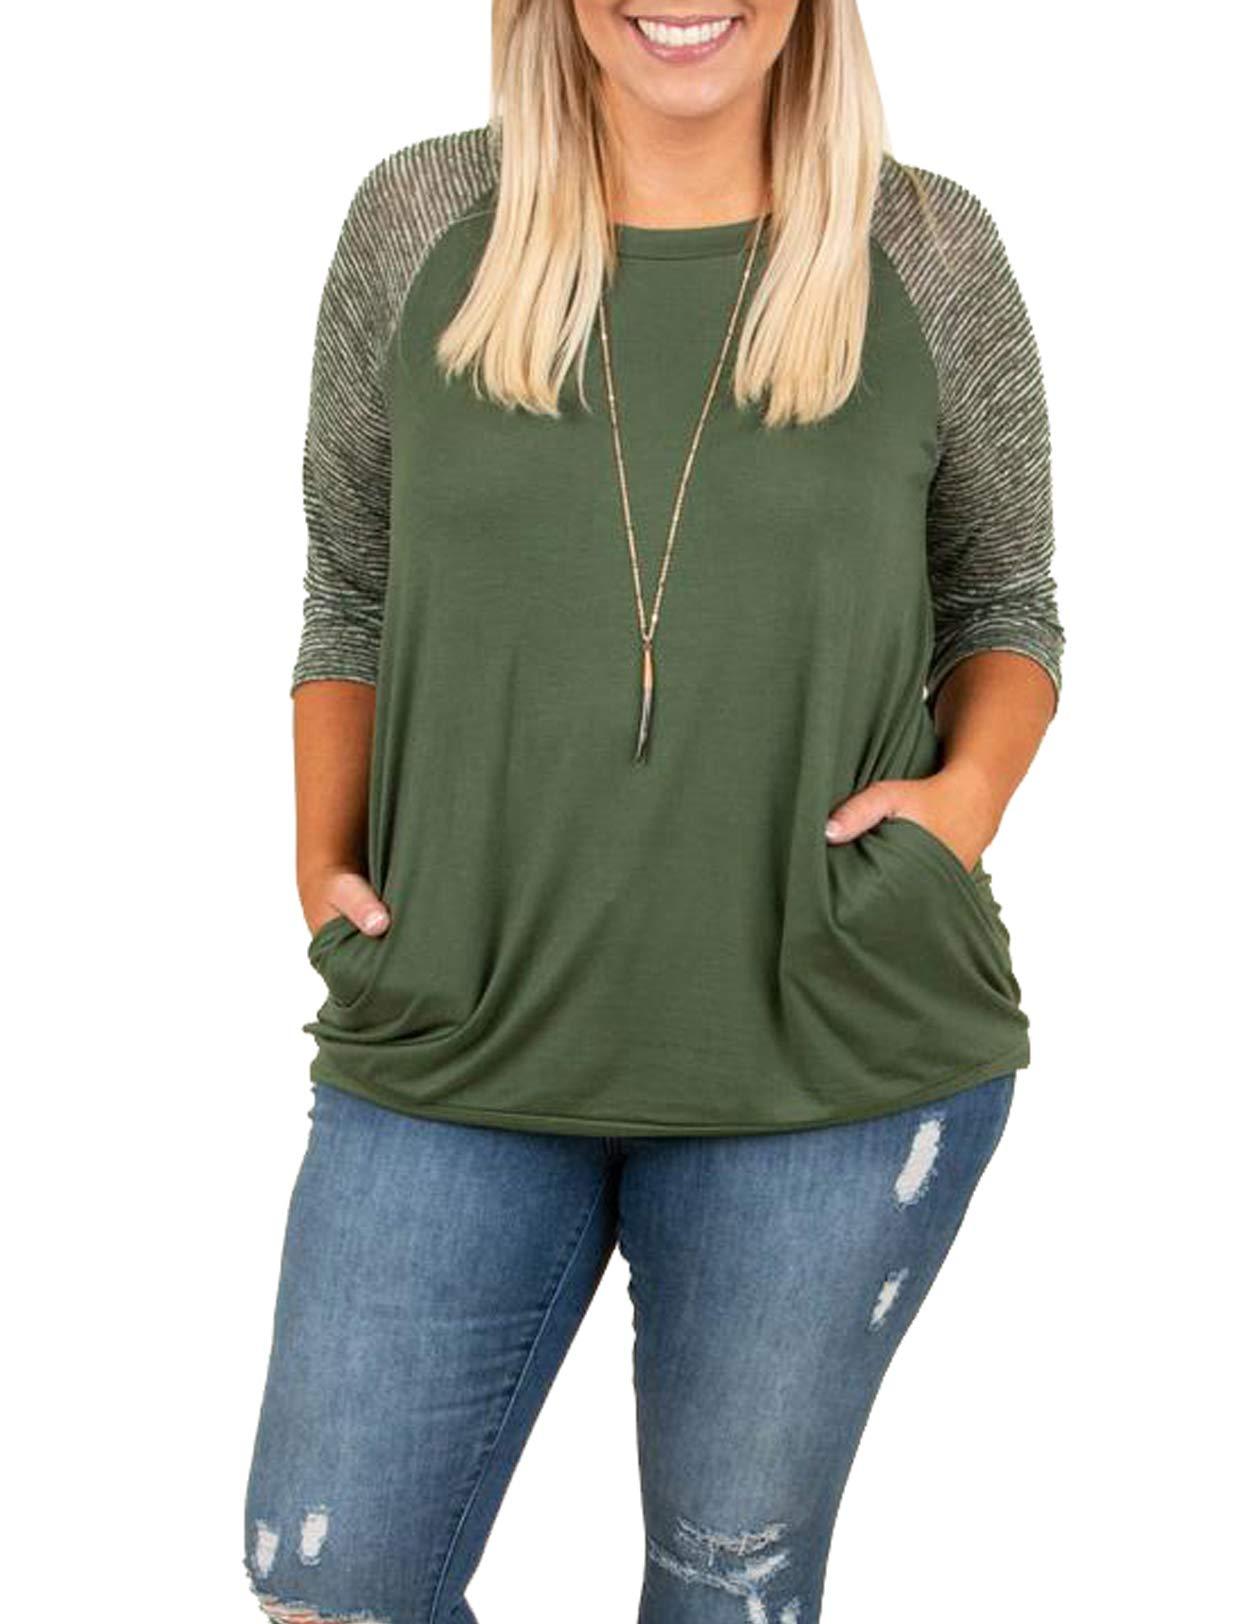 YSkkt Womens Tops Plus Size Raglan Shirt 3/4 Sleeve Striped Crew Neck Tshirt Tunic with Pockets